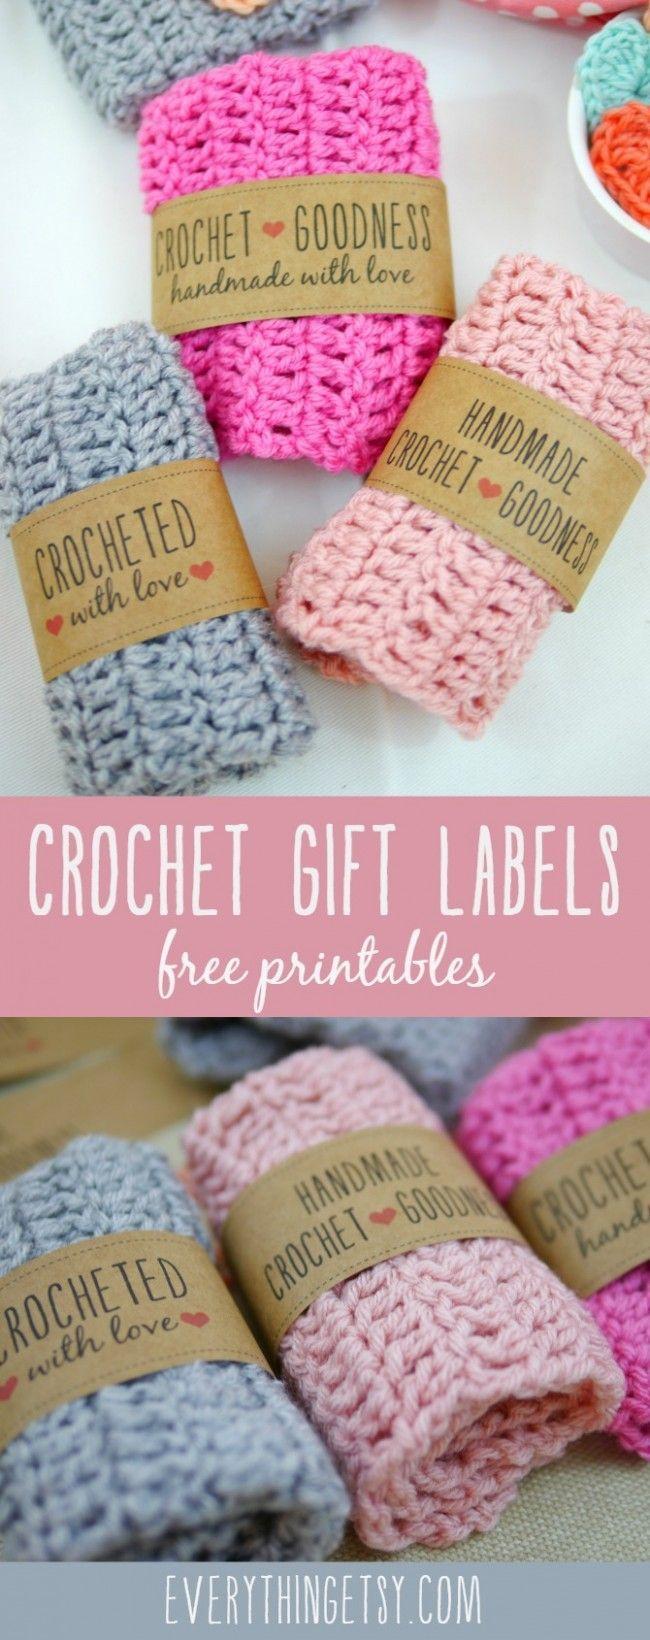 Free Printable Crochet Gift Labels | Crocheting | Pinterest - Free Printable Crochet Patterns